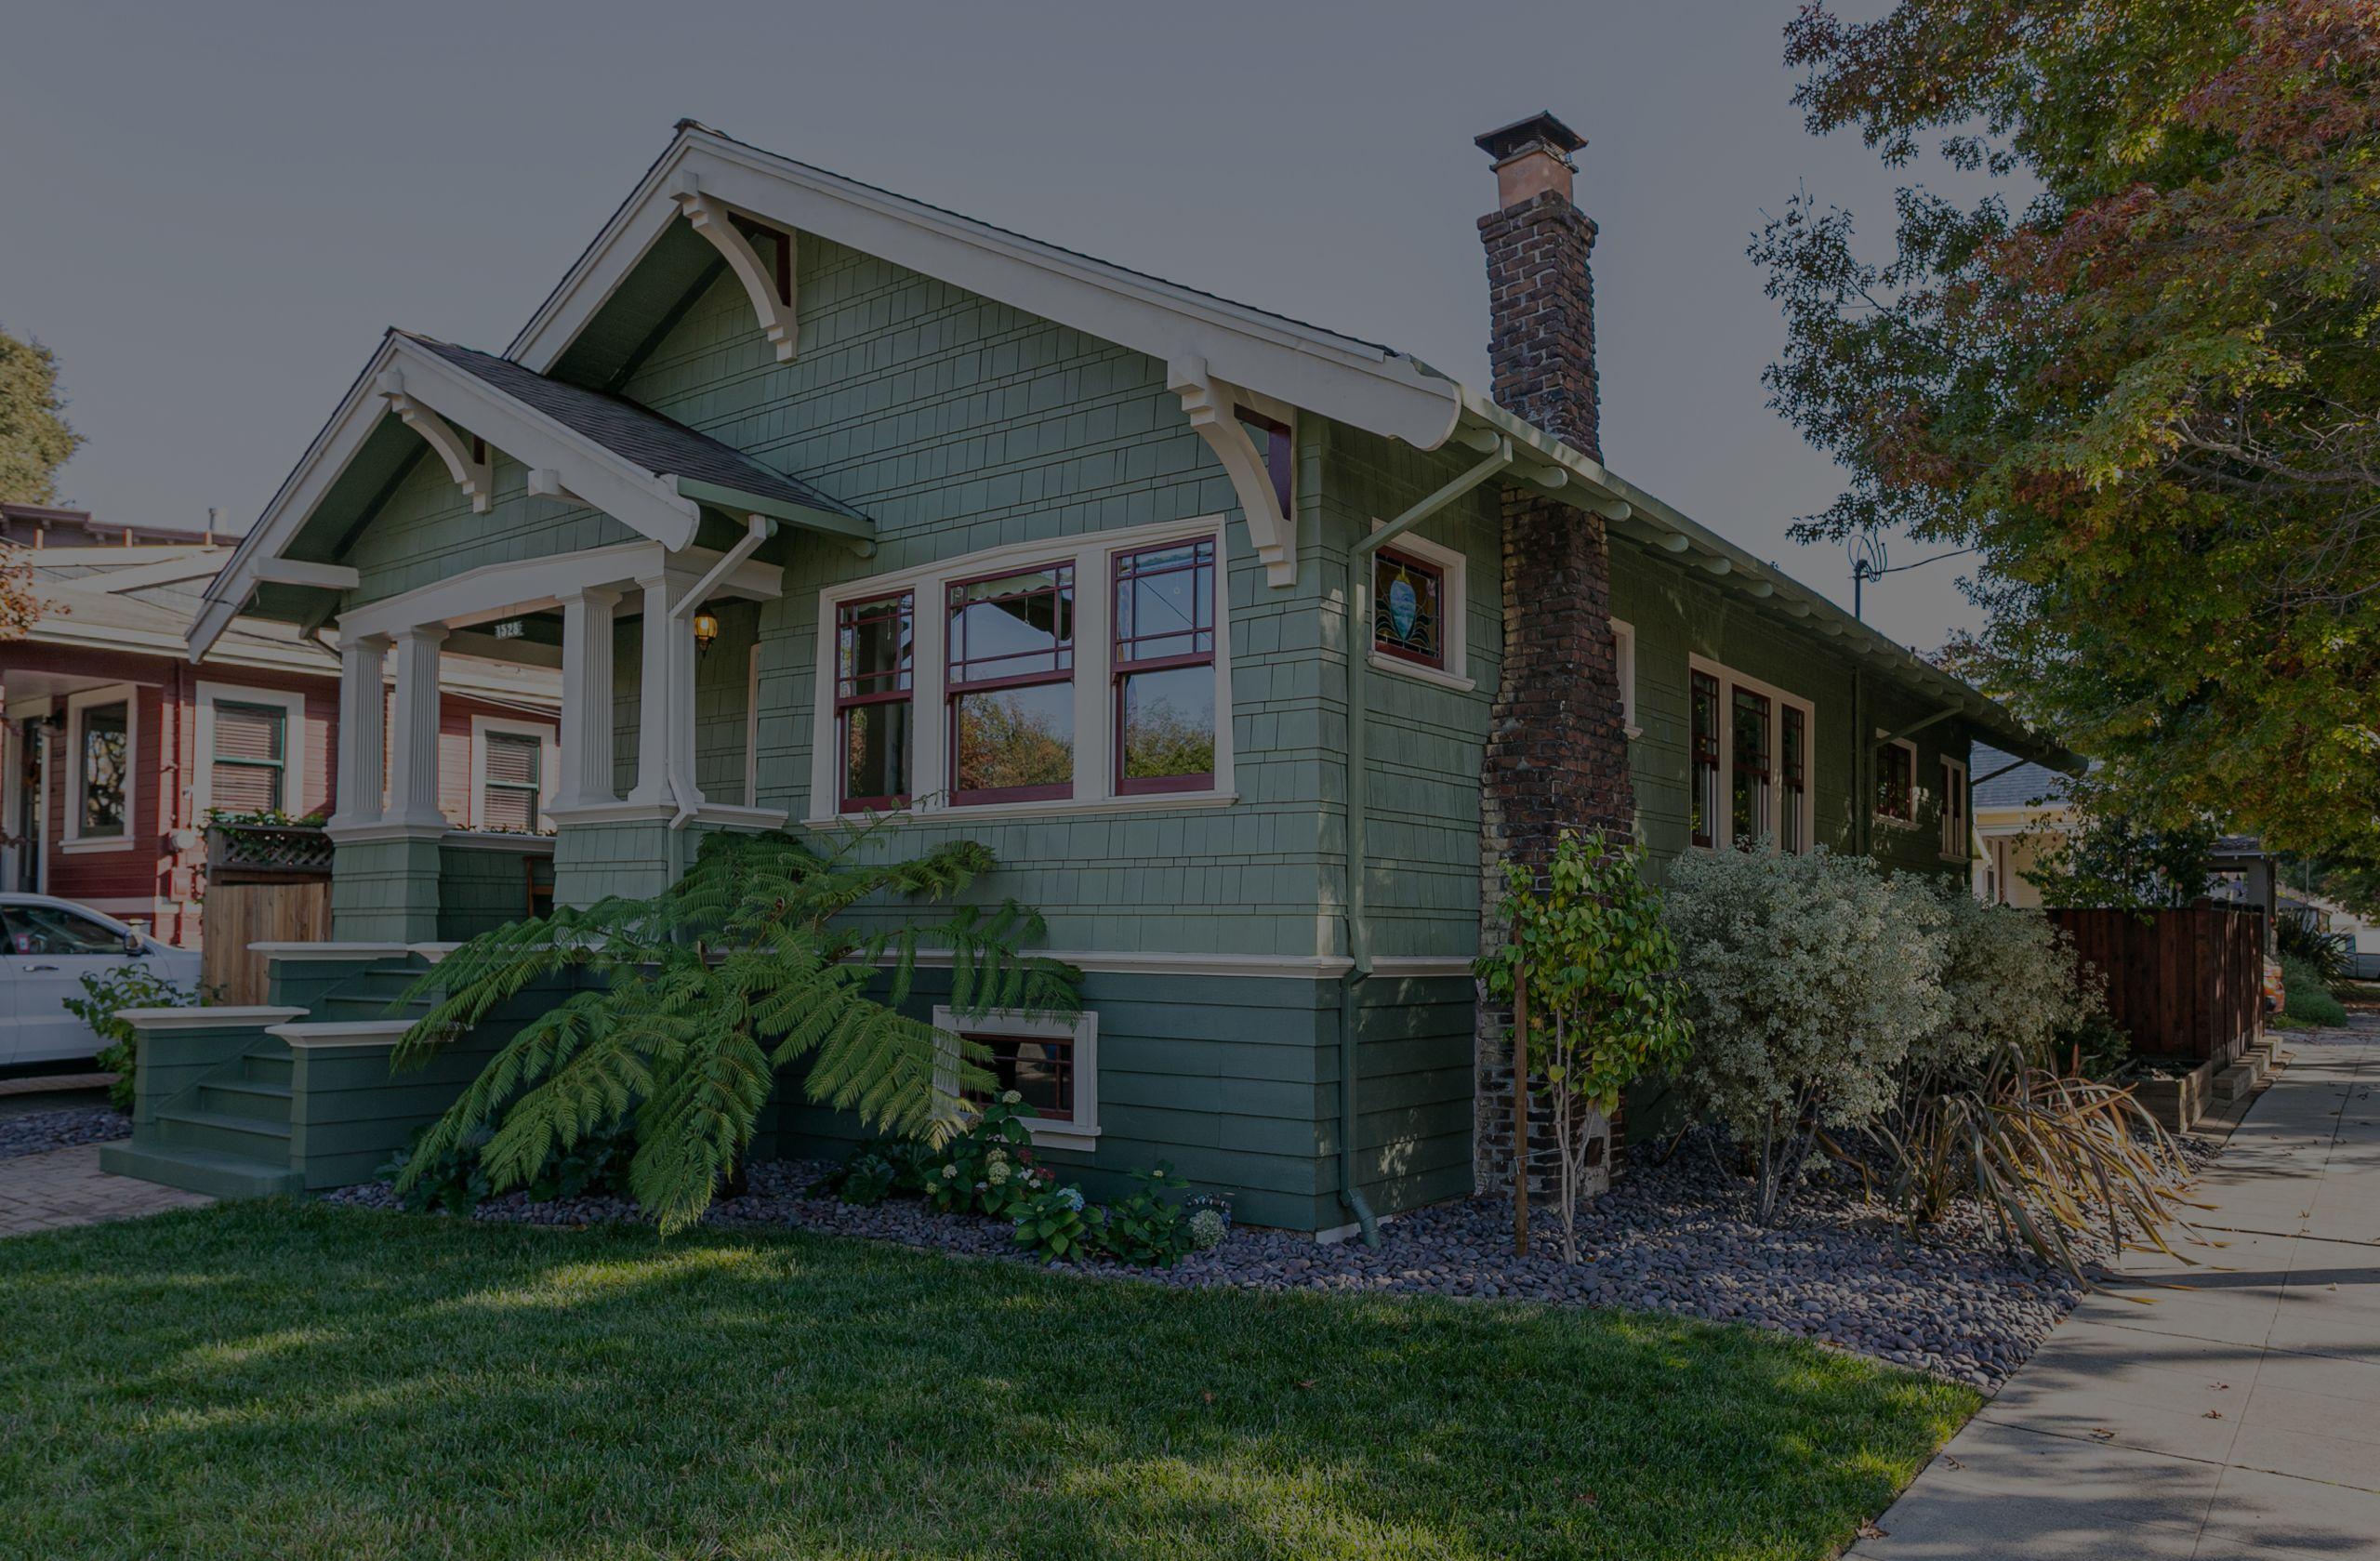 Craftsman cottage on Santa Clara Ave